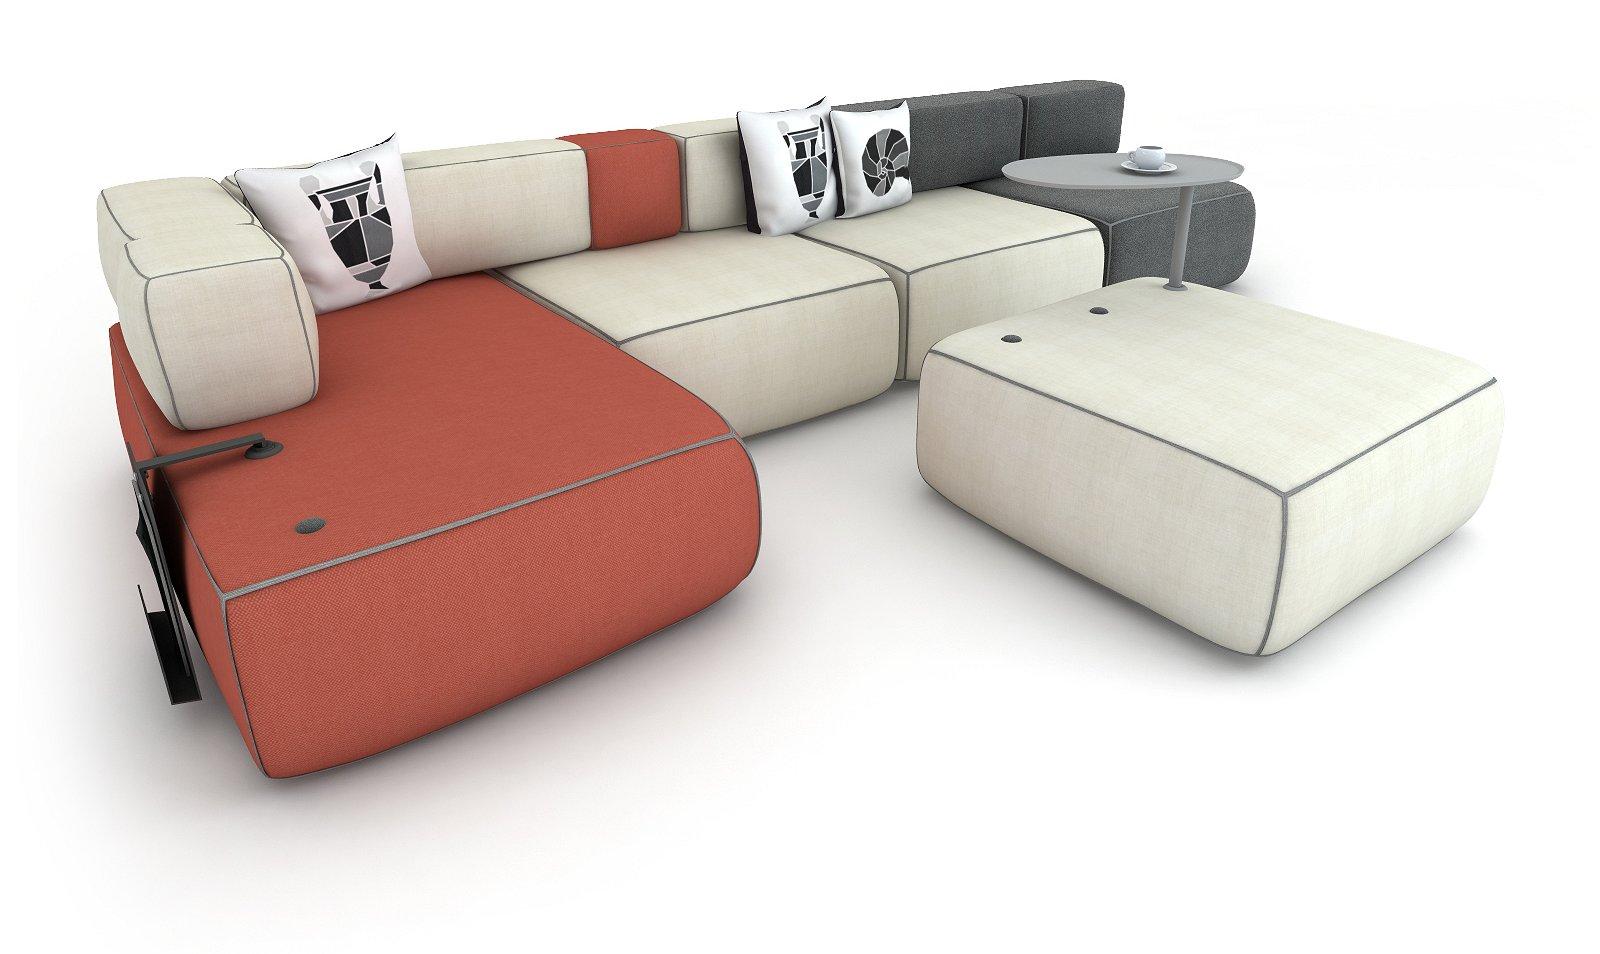 Awesome Divani Componibili Economici Ideas - Home Design - joygree.info